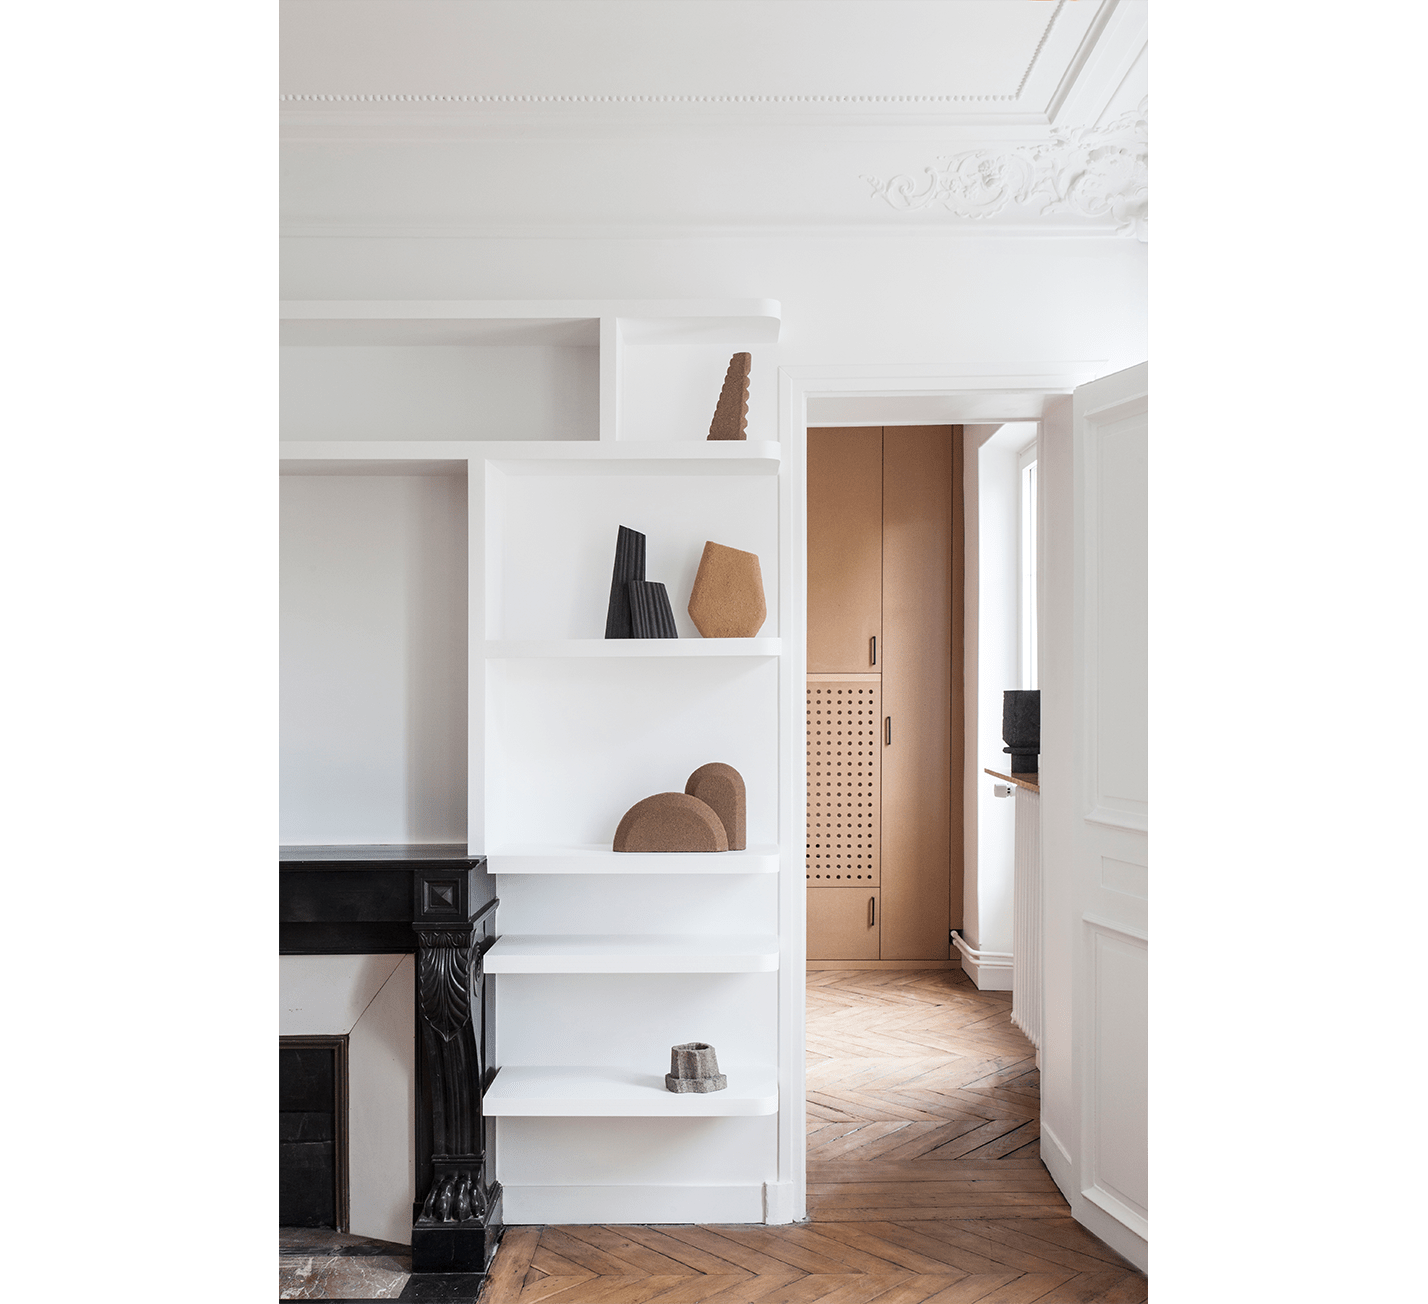 Projet-Jules-Cesar-Atelier-Steve-Pauline-Borgia-Architecte-interieur-09-min-1